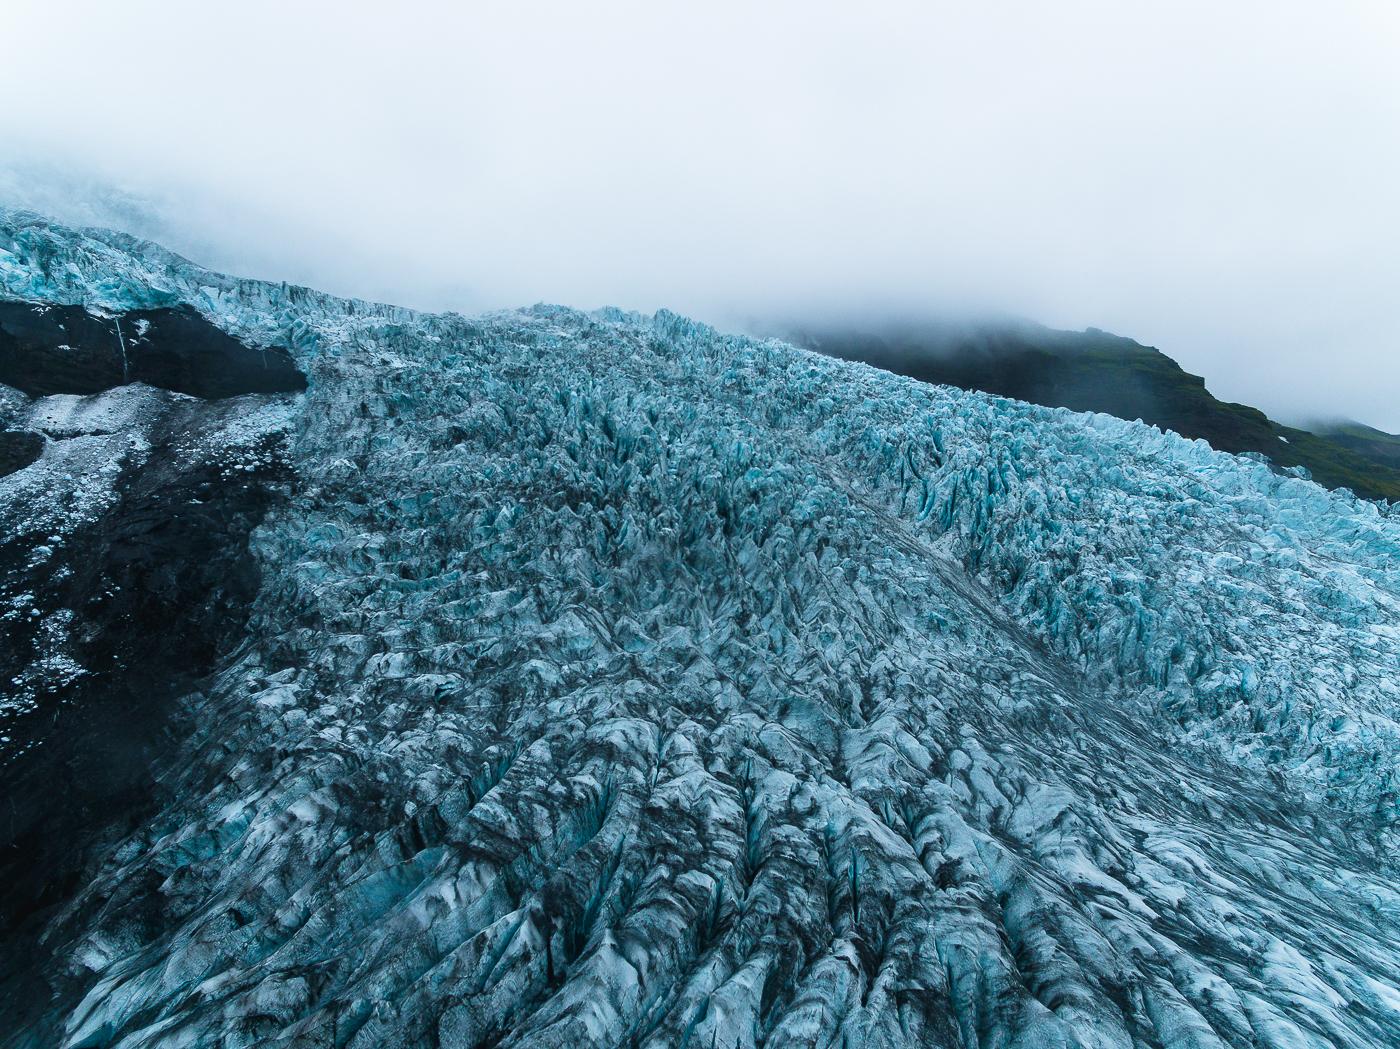 gabornagy_photography_iceland_glacier8.jpg